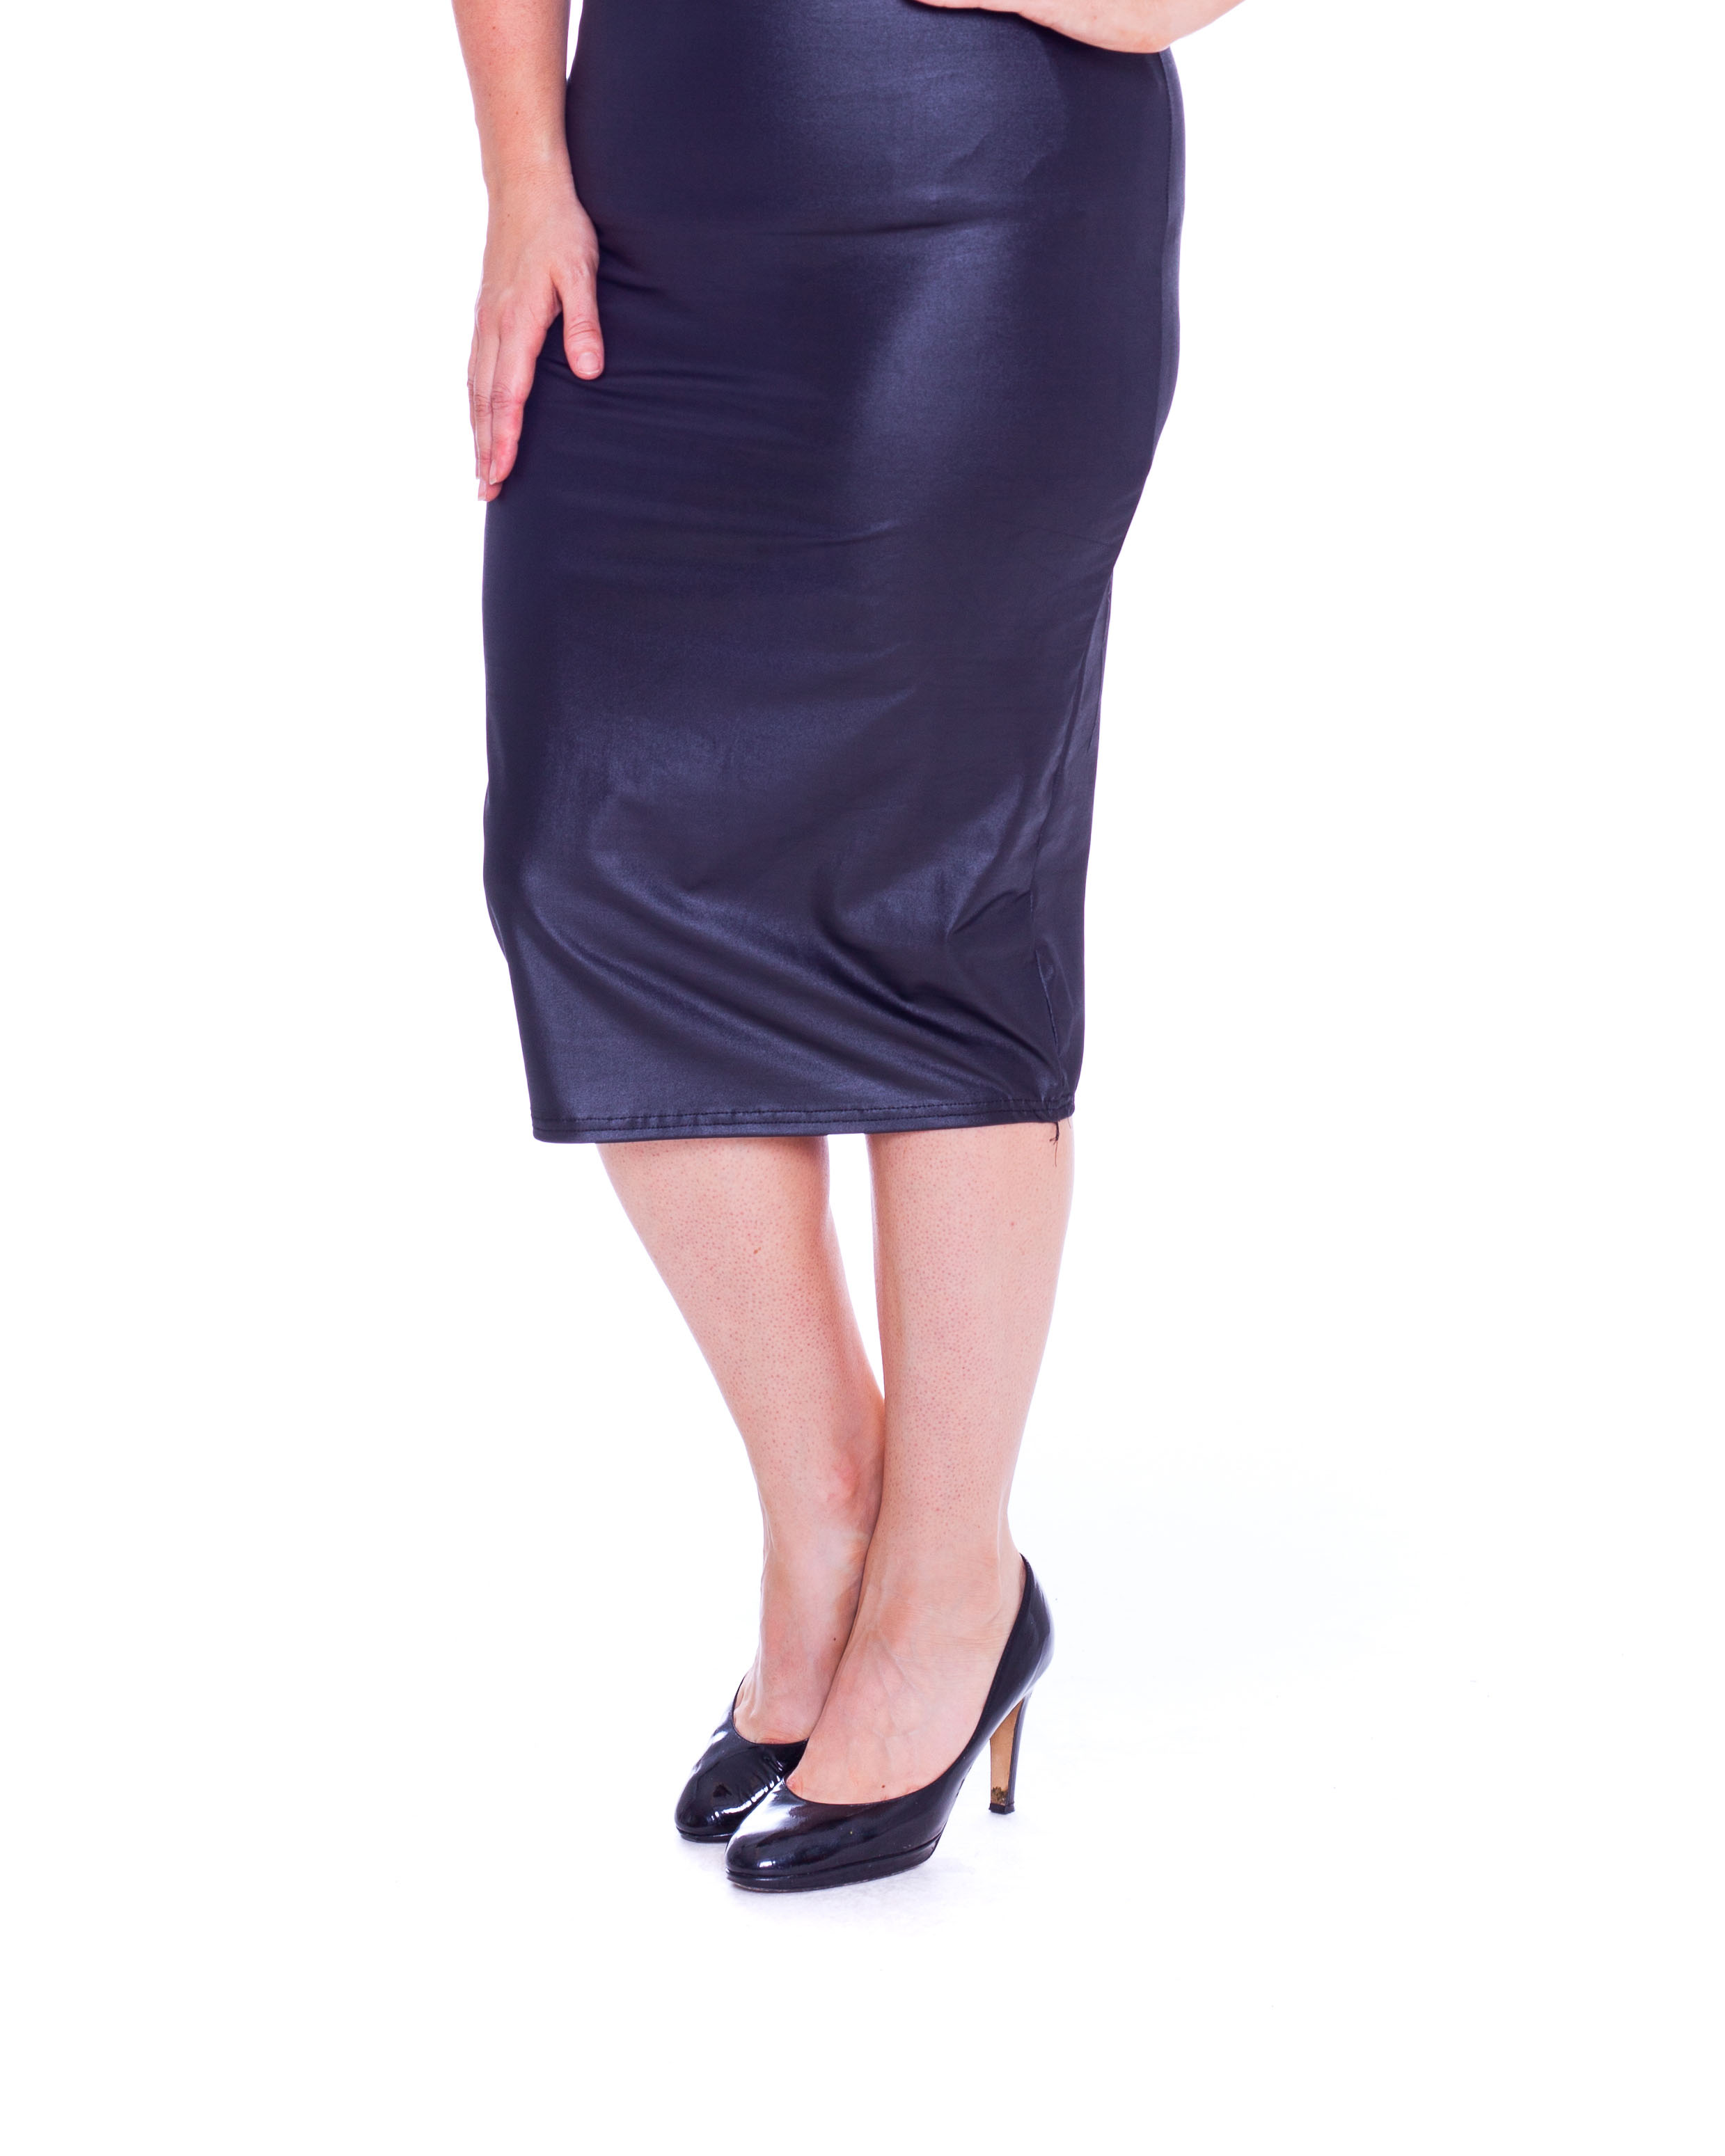 Unique Womens Button Down Light Weight 90u0026#39;s Denim Look Skater Style Skirt UK 8 10 12 14 | EBay